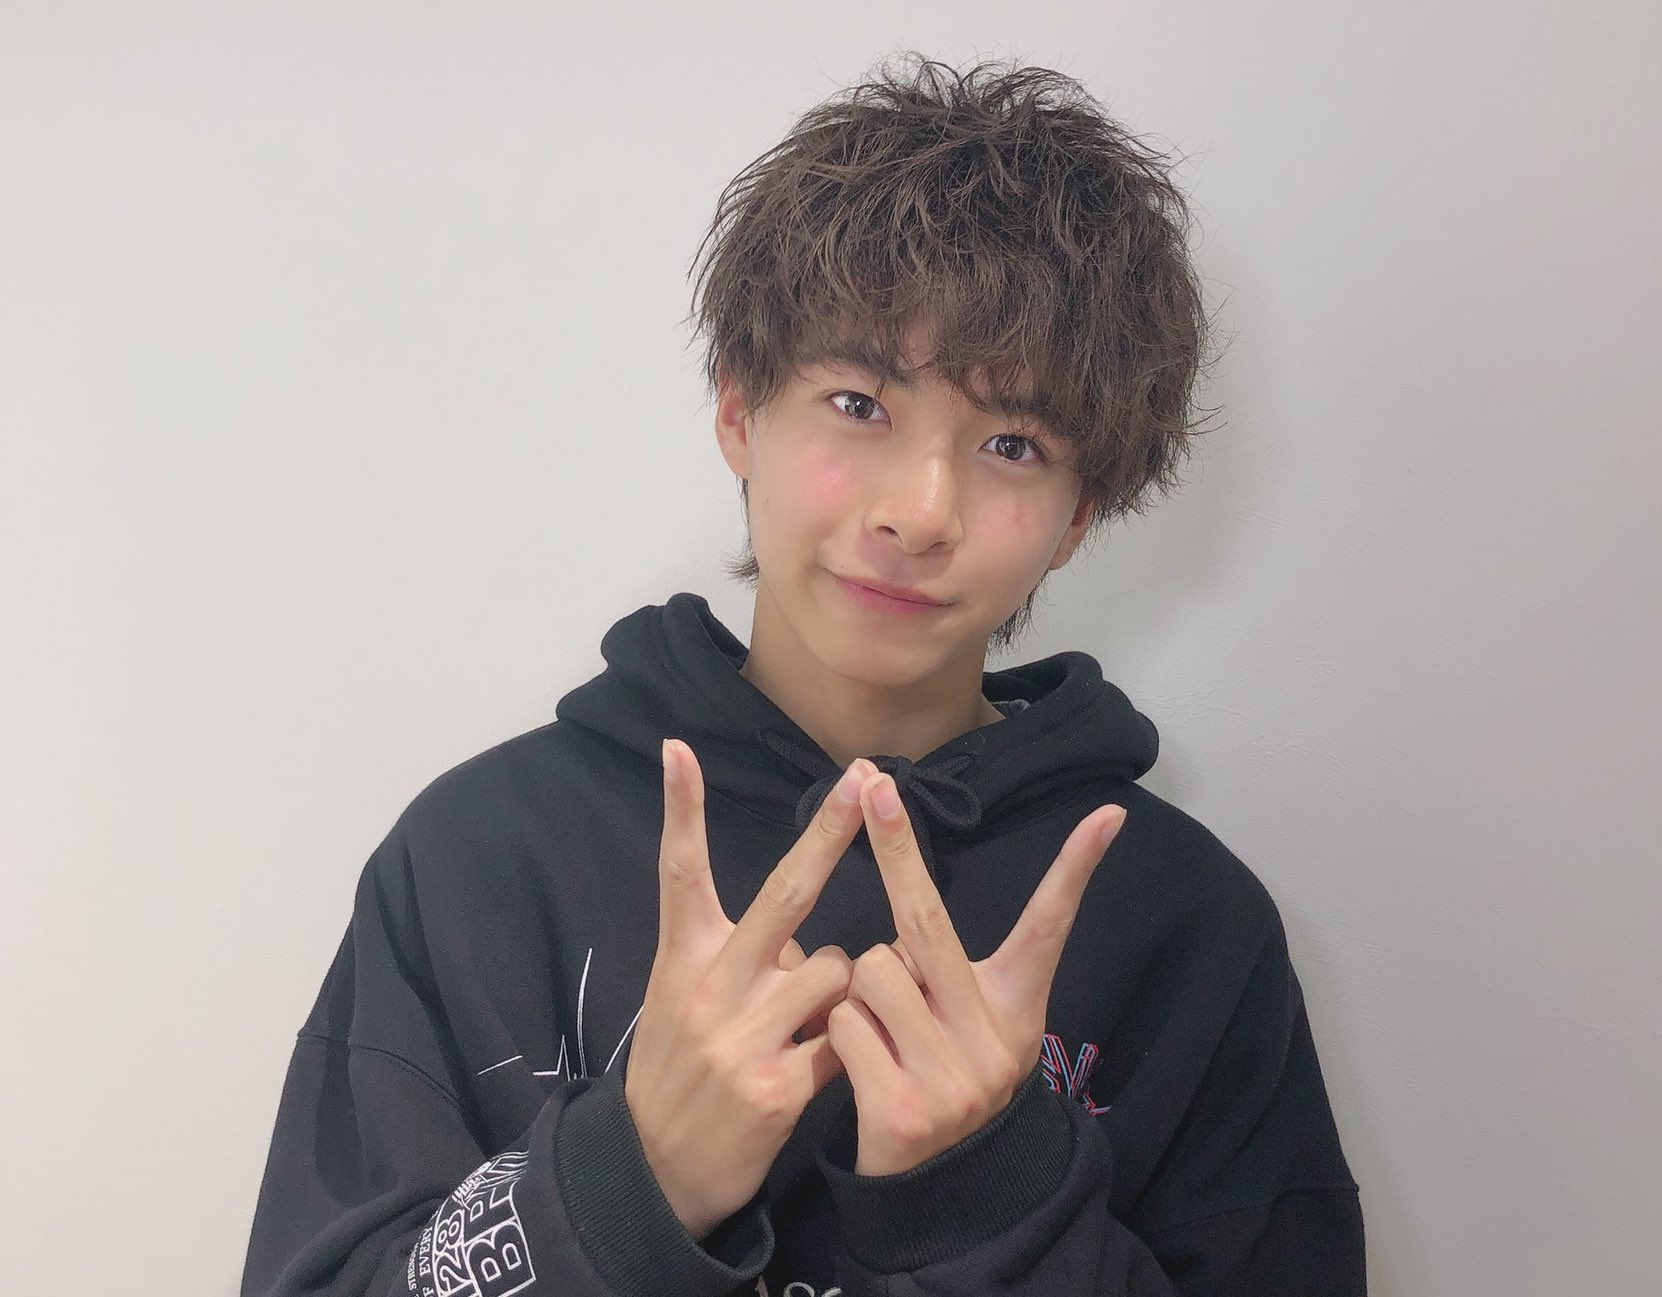 komiya 8 - 【キラメイジャー】小宮璃央のプロフィールまとめ|兄弟・高校などを調査